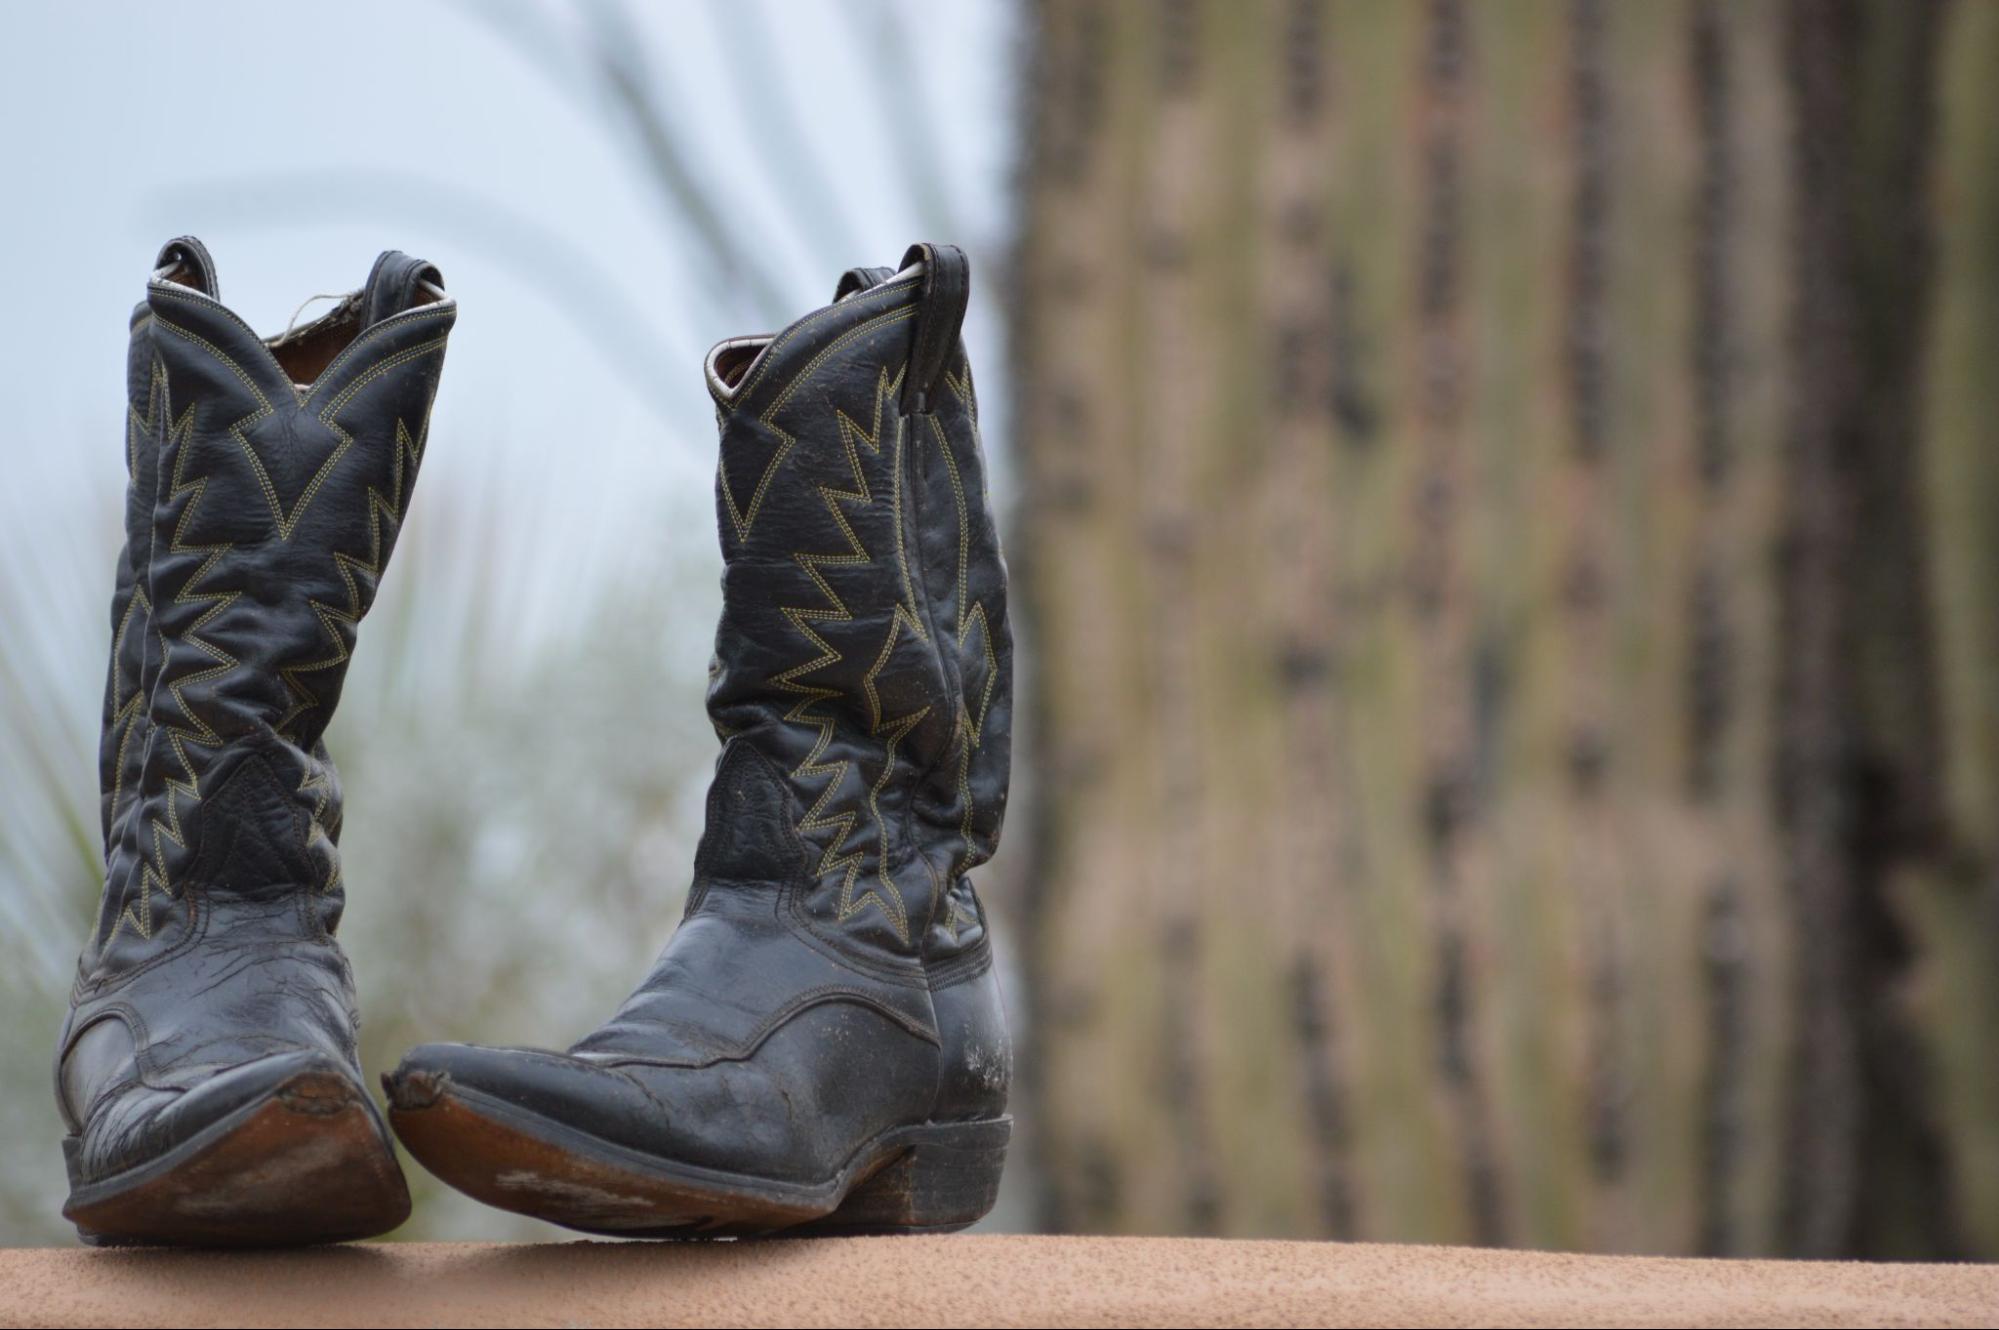 Cowboy boot in Milwood neighborhood in Austin, Texas